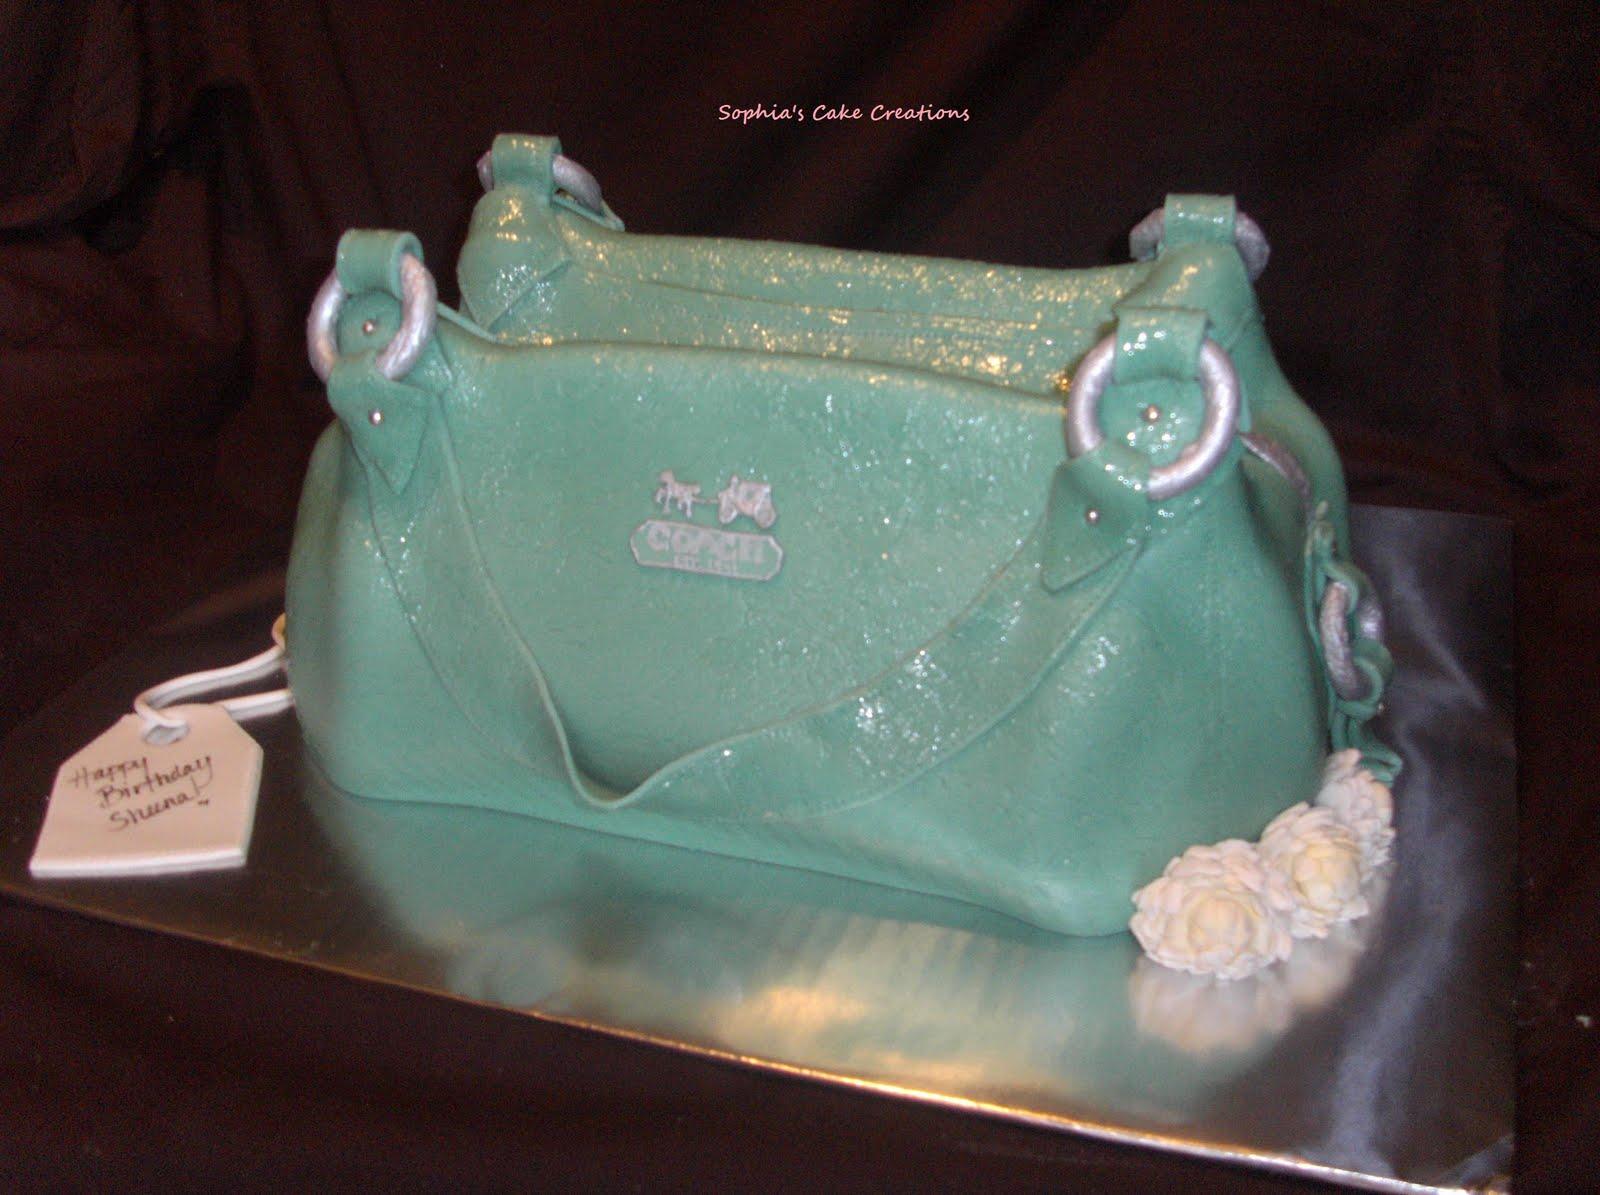 designer-bags-lv-gucci-prada-cakes-cupcakes-4